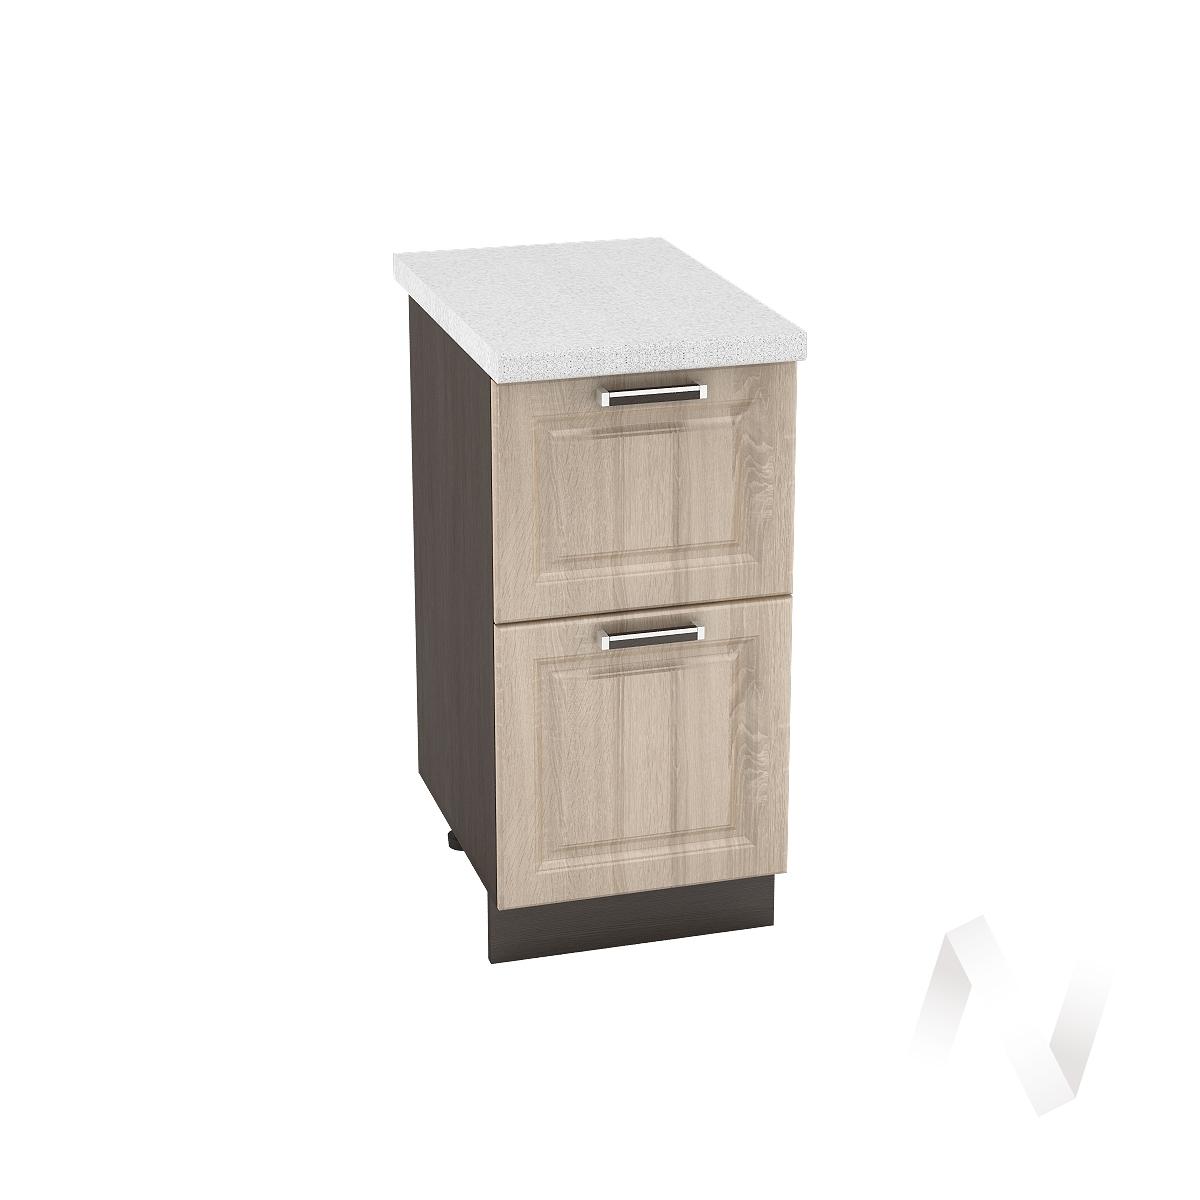 "Кухня ""Прага"": Шкаф нижний с 2-мя ящиками 400, ШН2Я 400 (дуб сонома/корпус венге)"